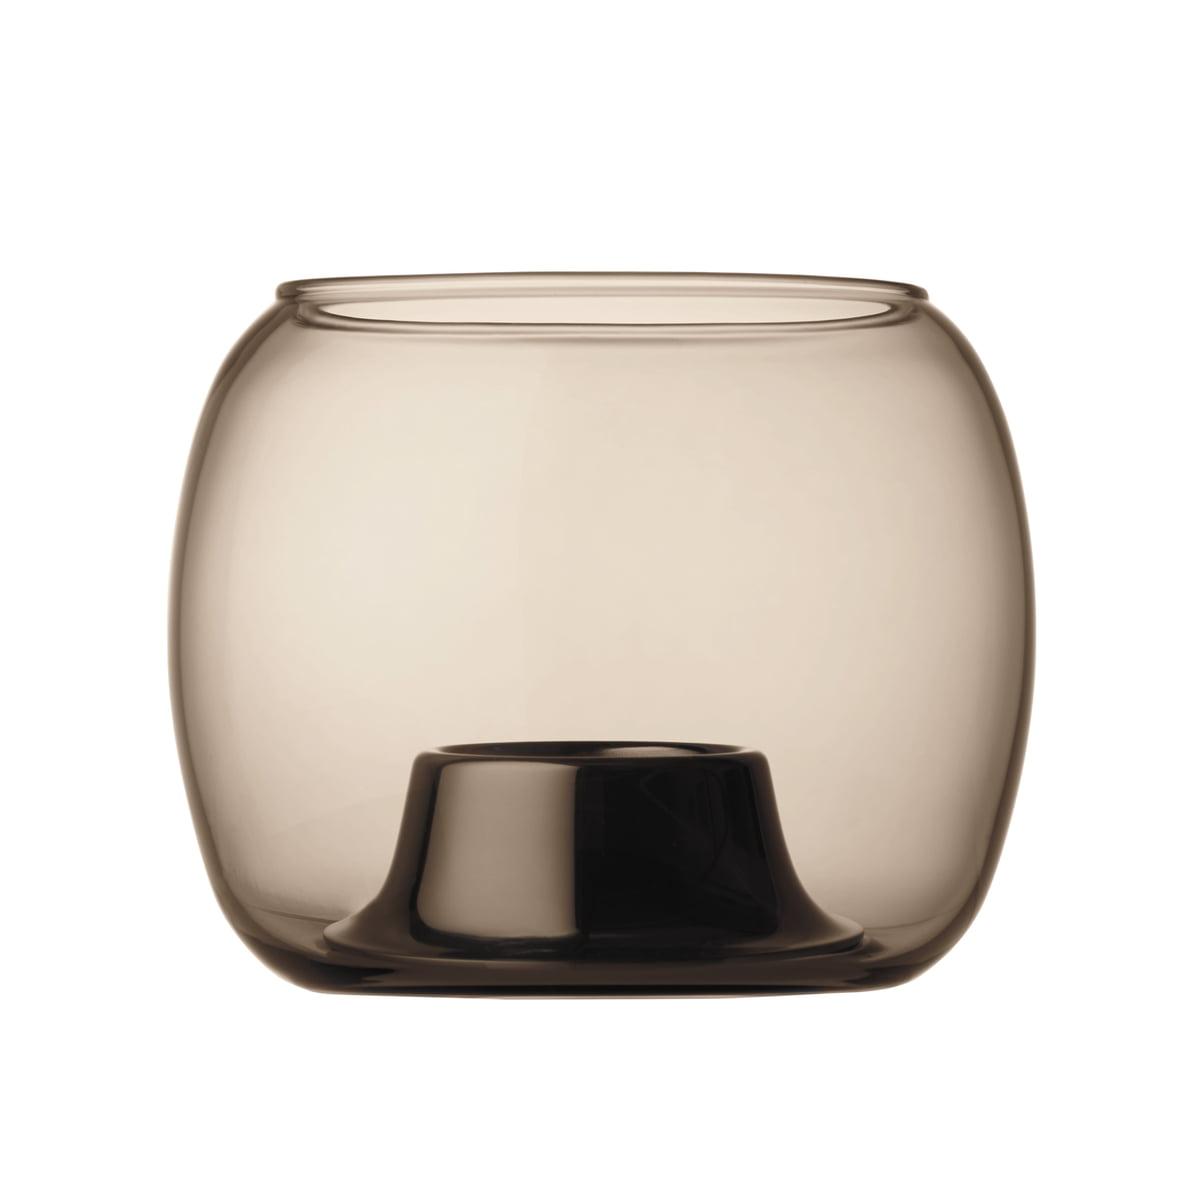 Iittala - Kaasa Teelichthalter 141 x 115 mm, sand | Dekoration > Kerzen und Kerzenständer > Kerzenständer | Sand | Edelstahleinsatz poliert -  mundegblasenes glas| glas (mundgeblasen) | Iittala